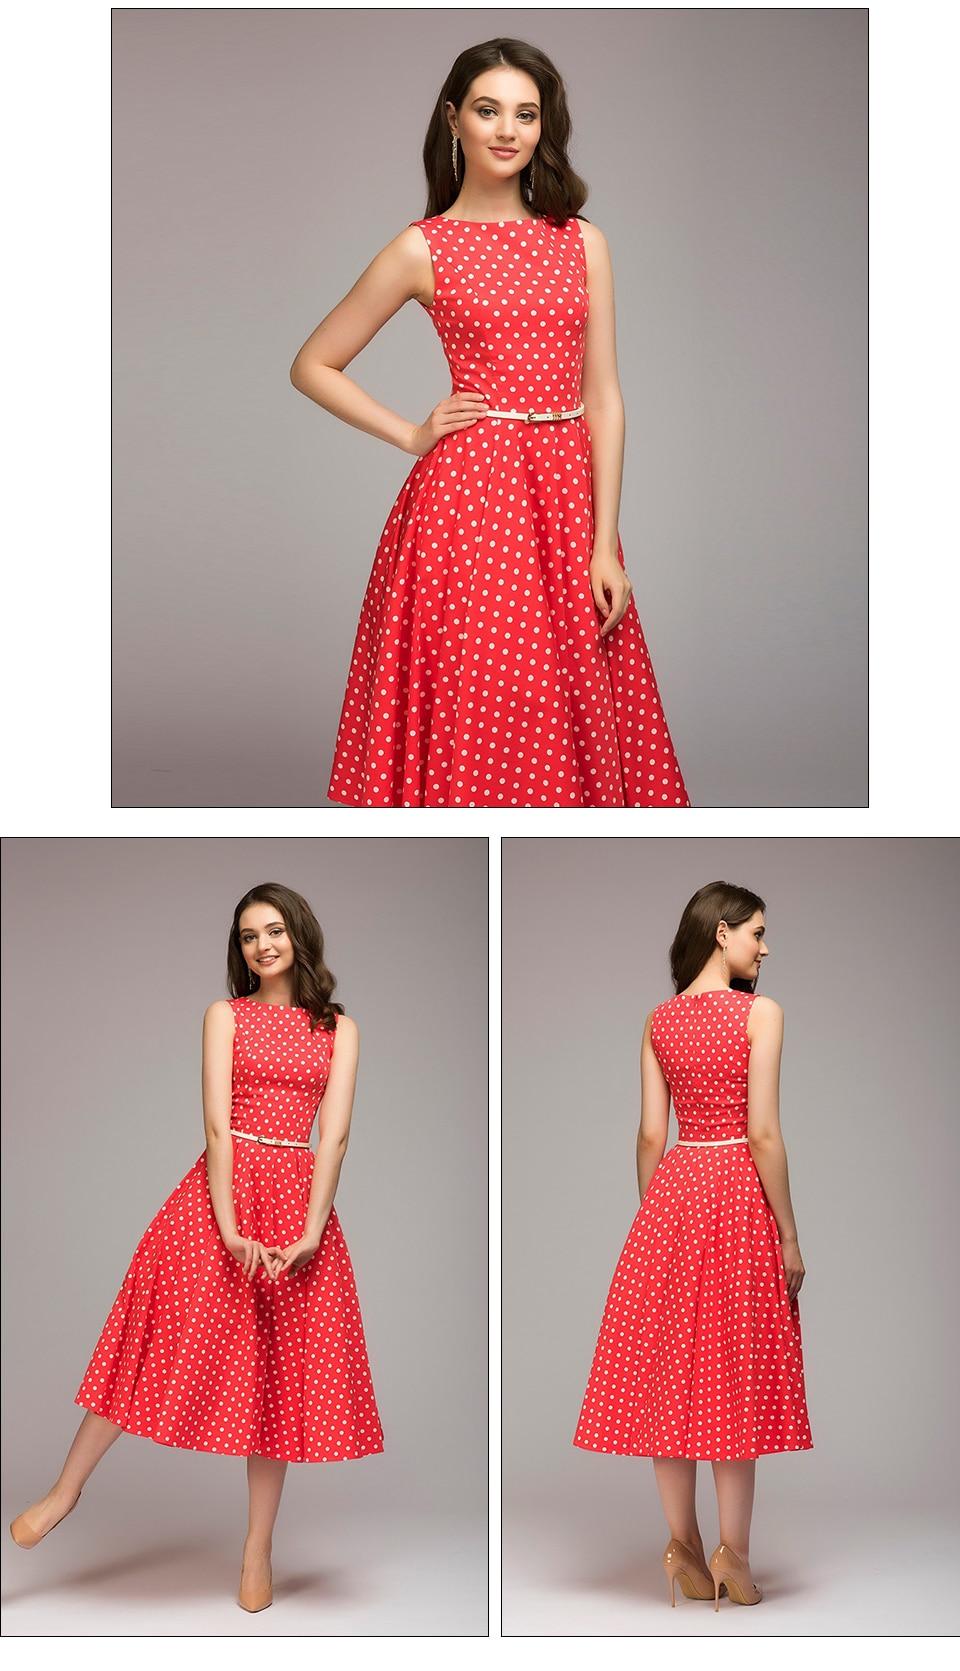 S.FLAVOR Women Vintage Dress Sleeveless O-neck Vestidos De Festa Women Elegant Thin Dot Printing Mid-Calf Casual Dress Female 6